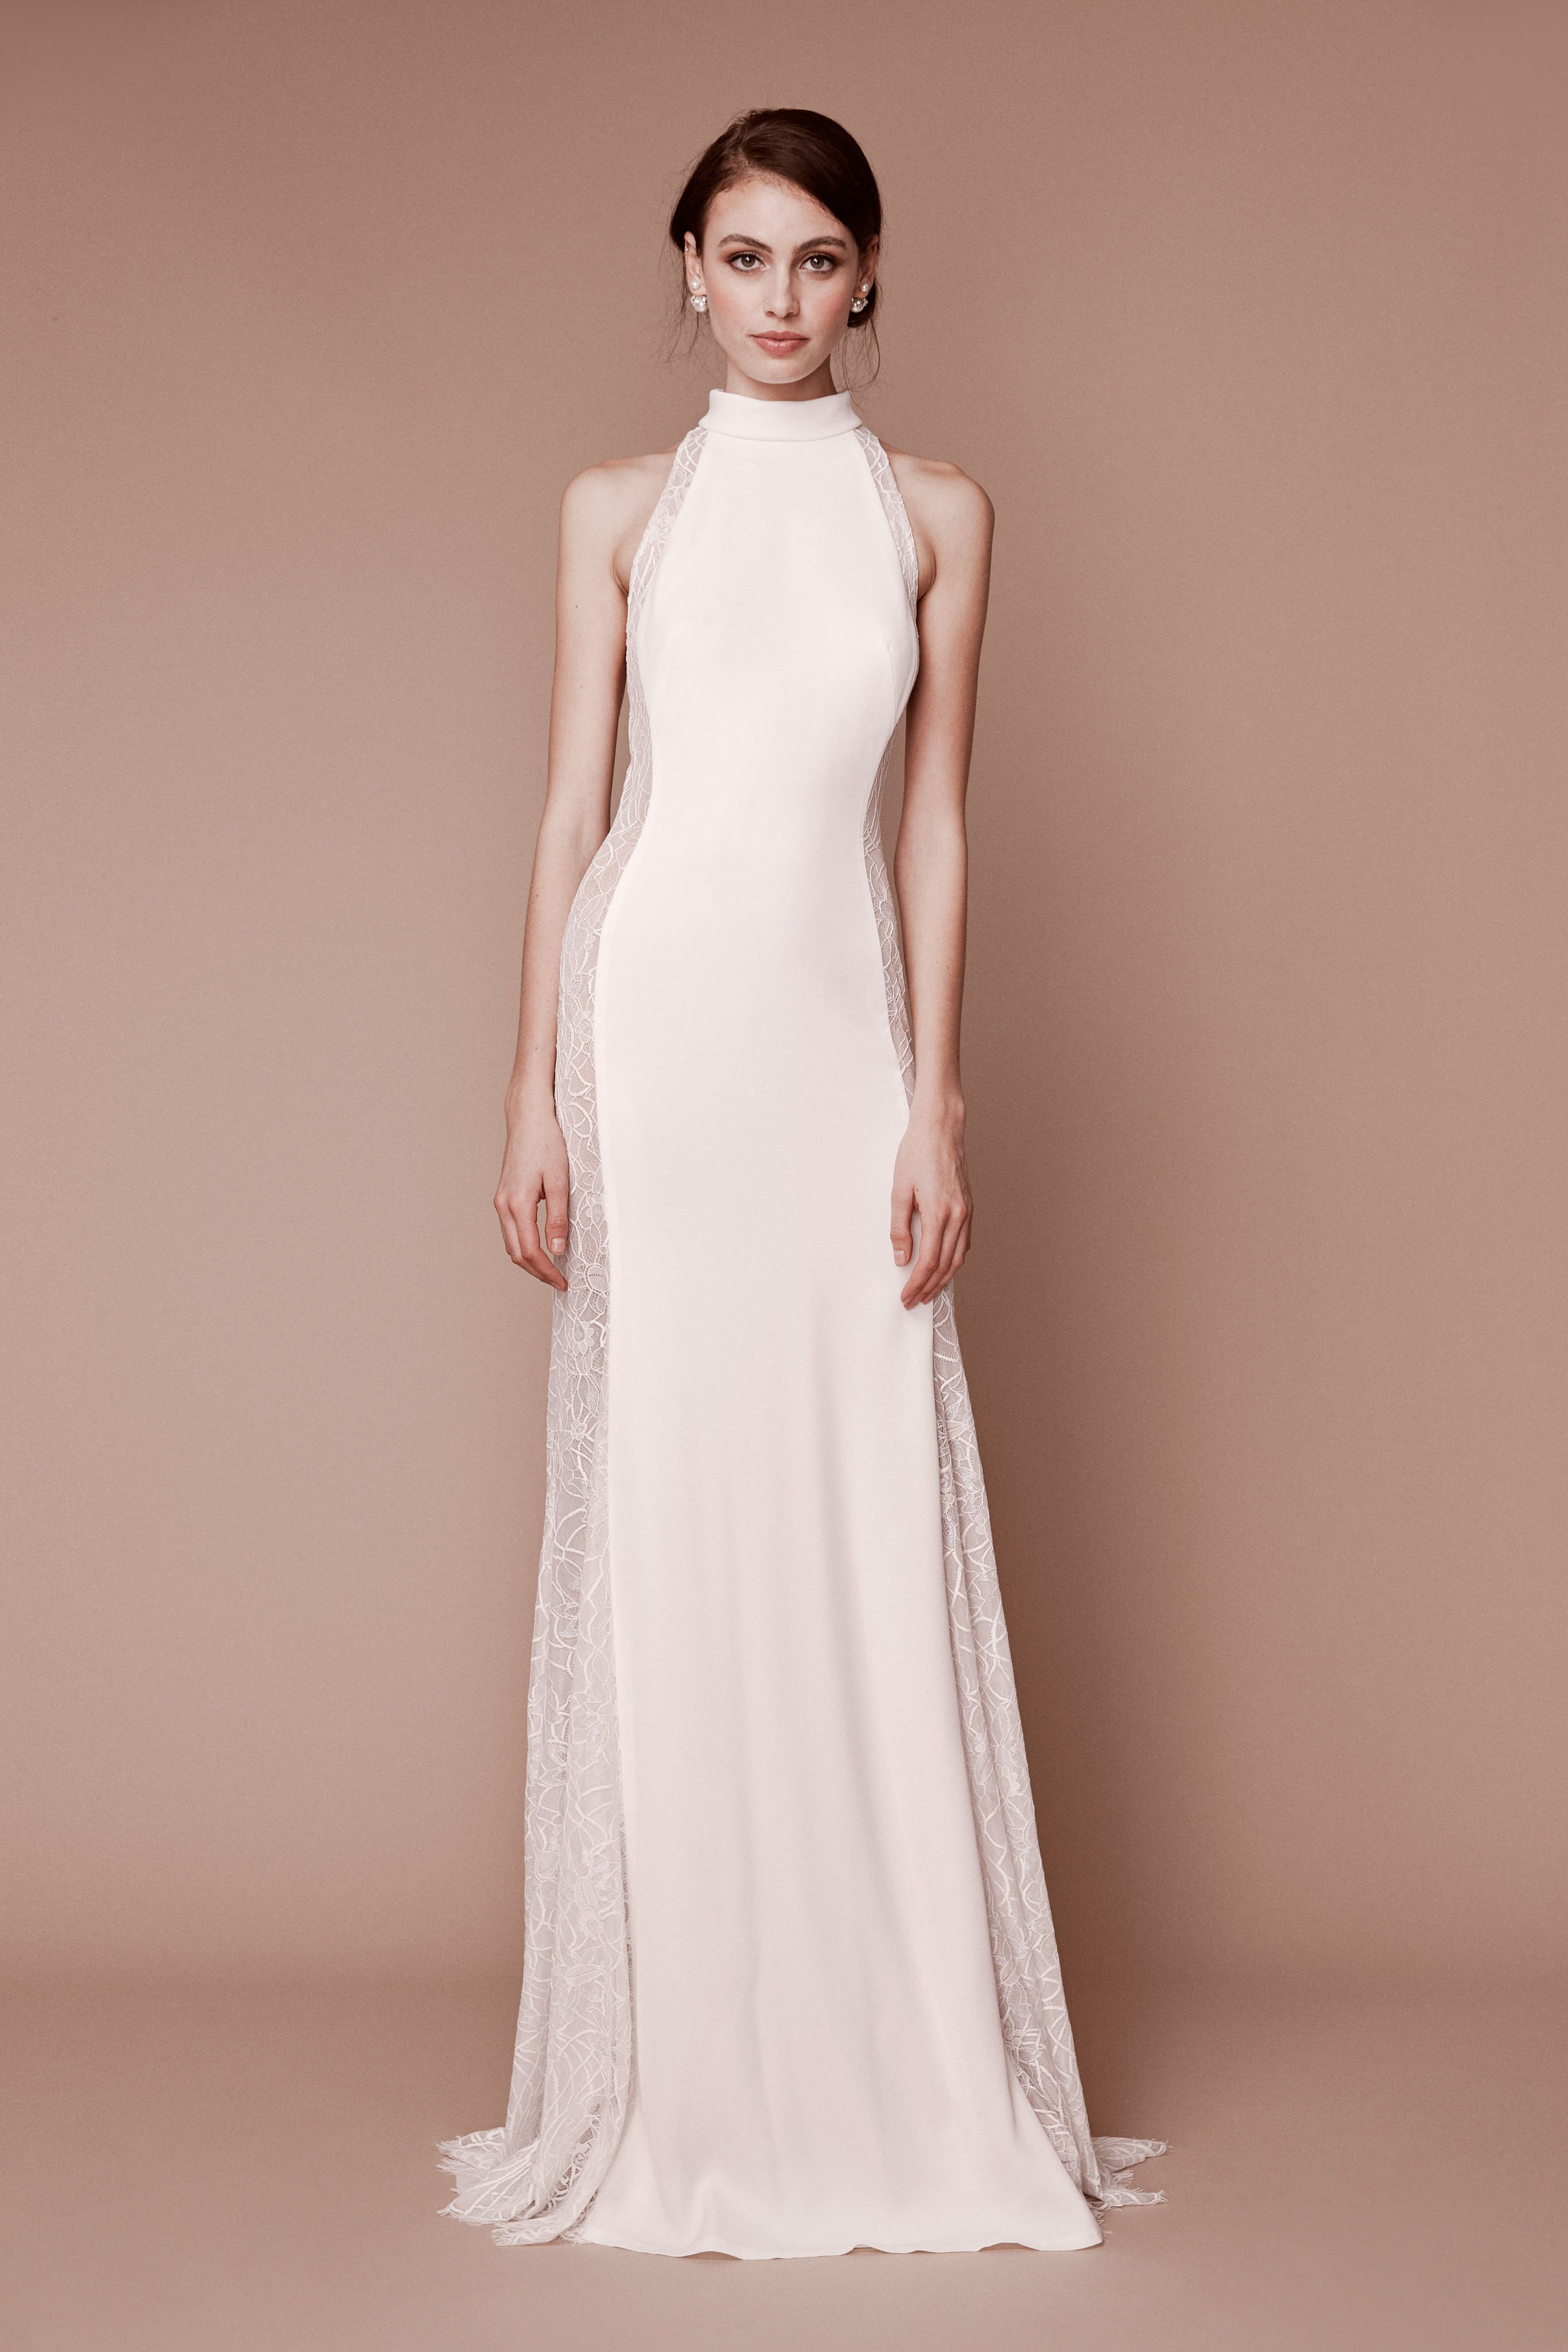 Idea by tadashi shoji on bridal fall 19 collection